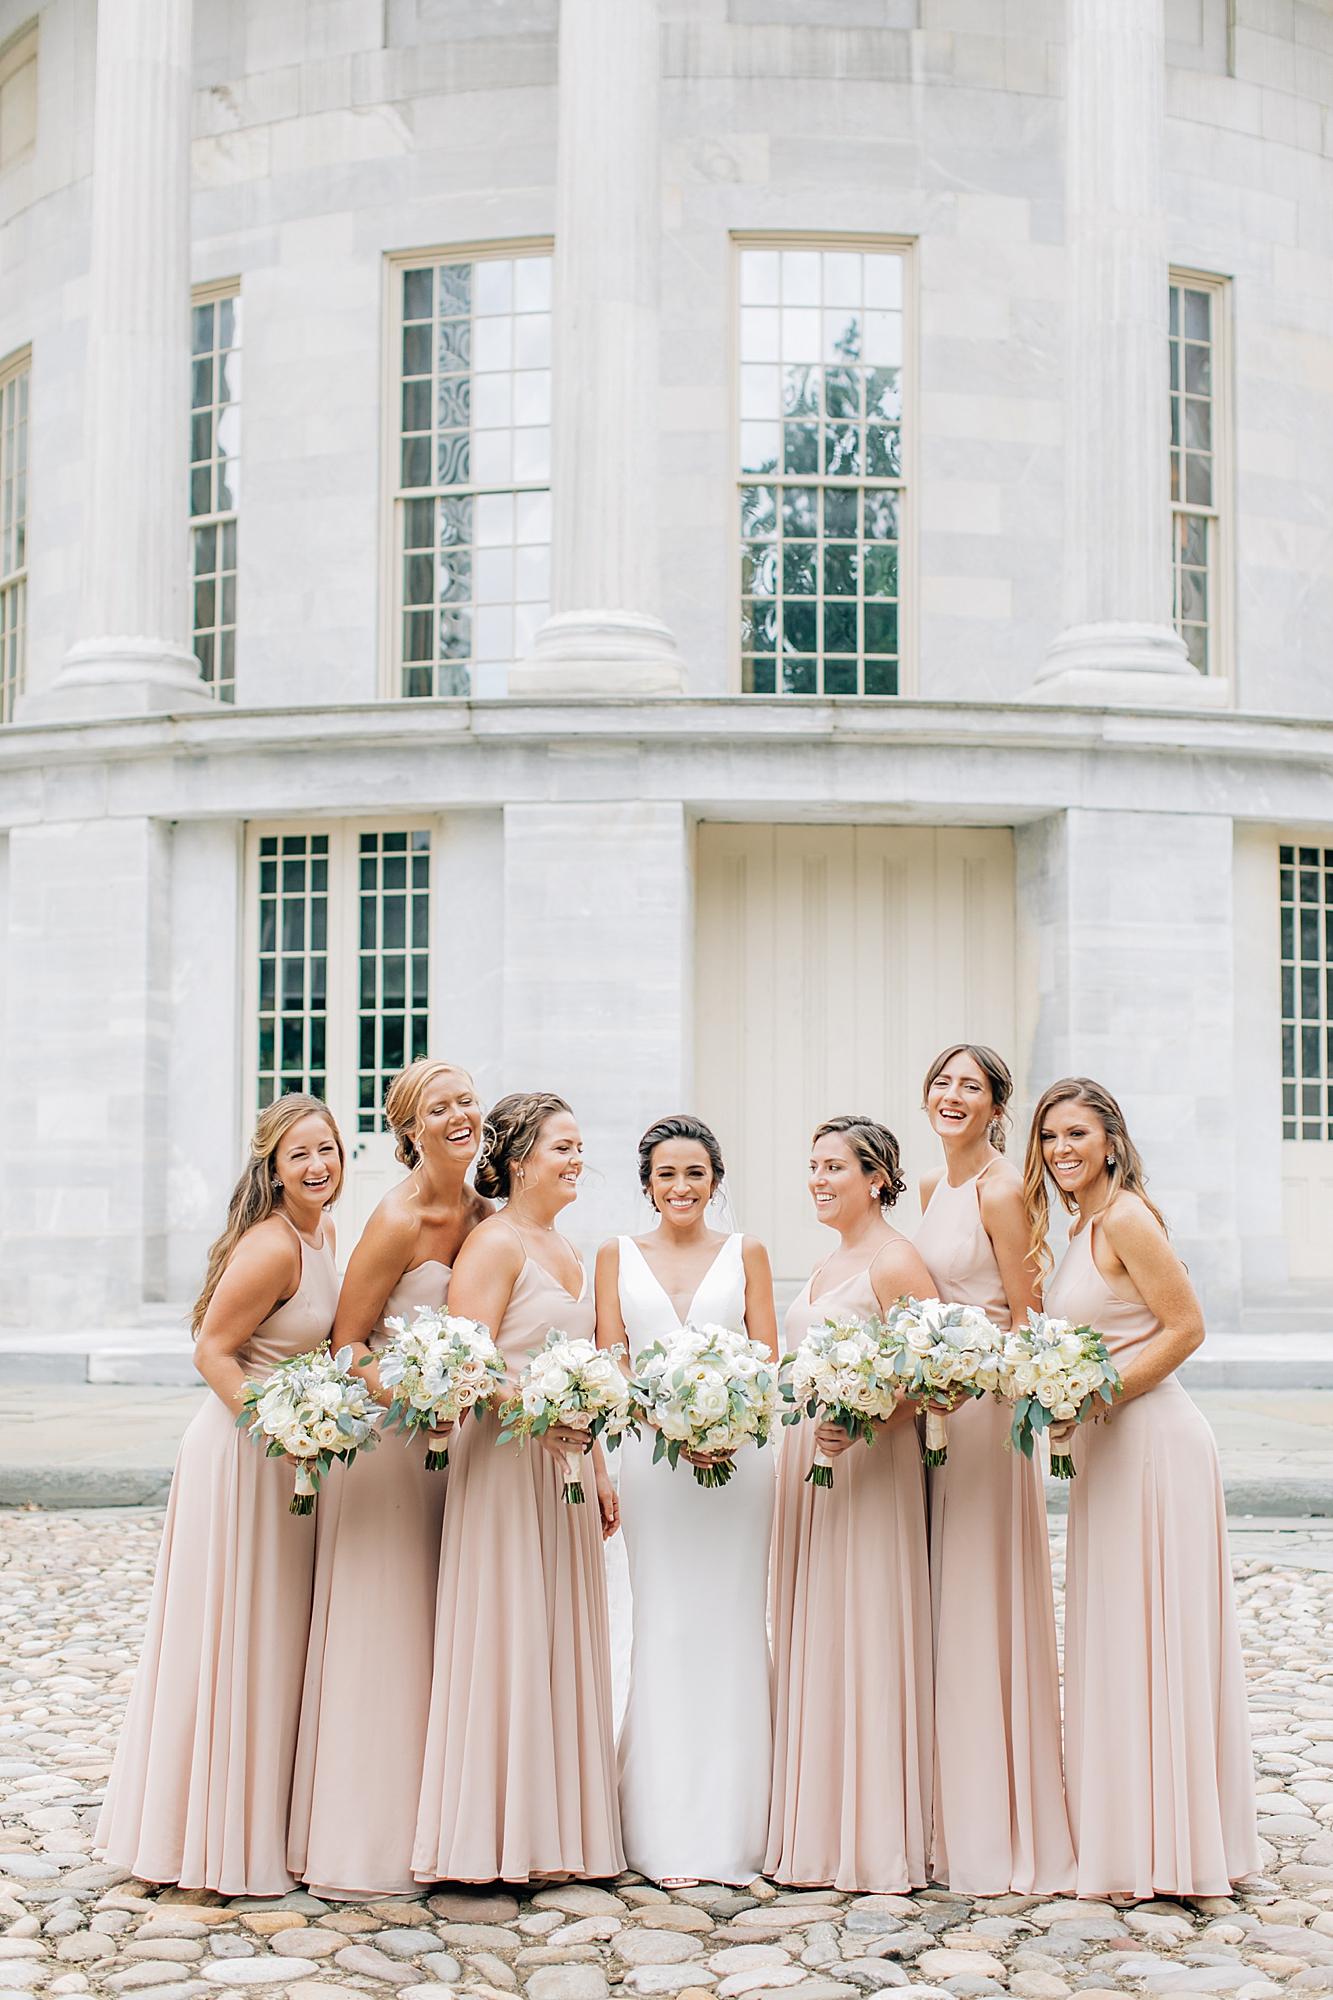 Cescaphe Philadelphia Film Wedding Photography by Magdalena Studios 25